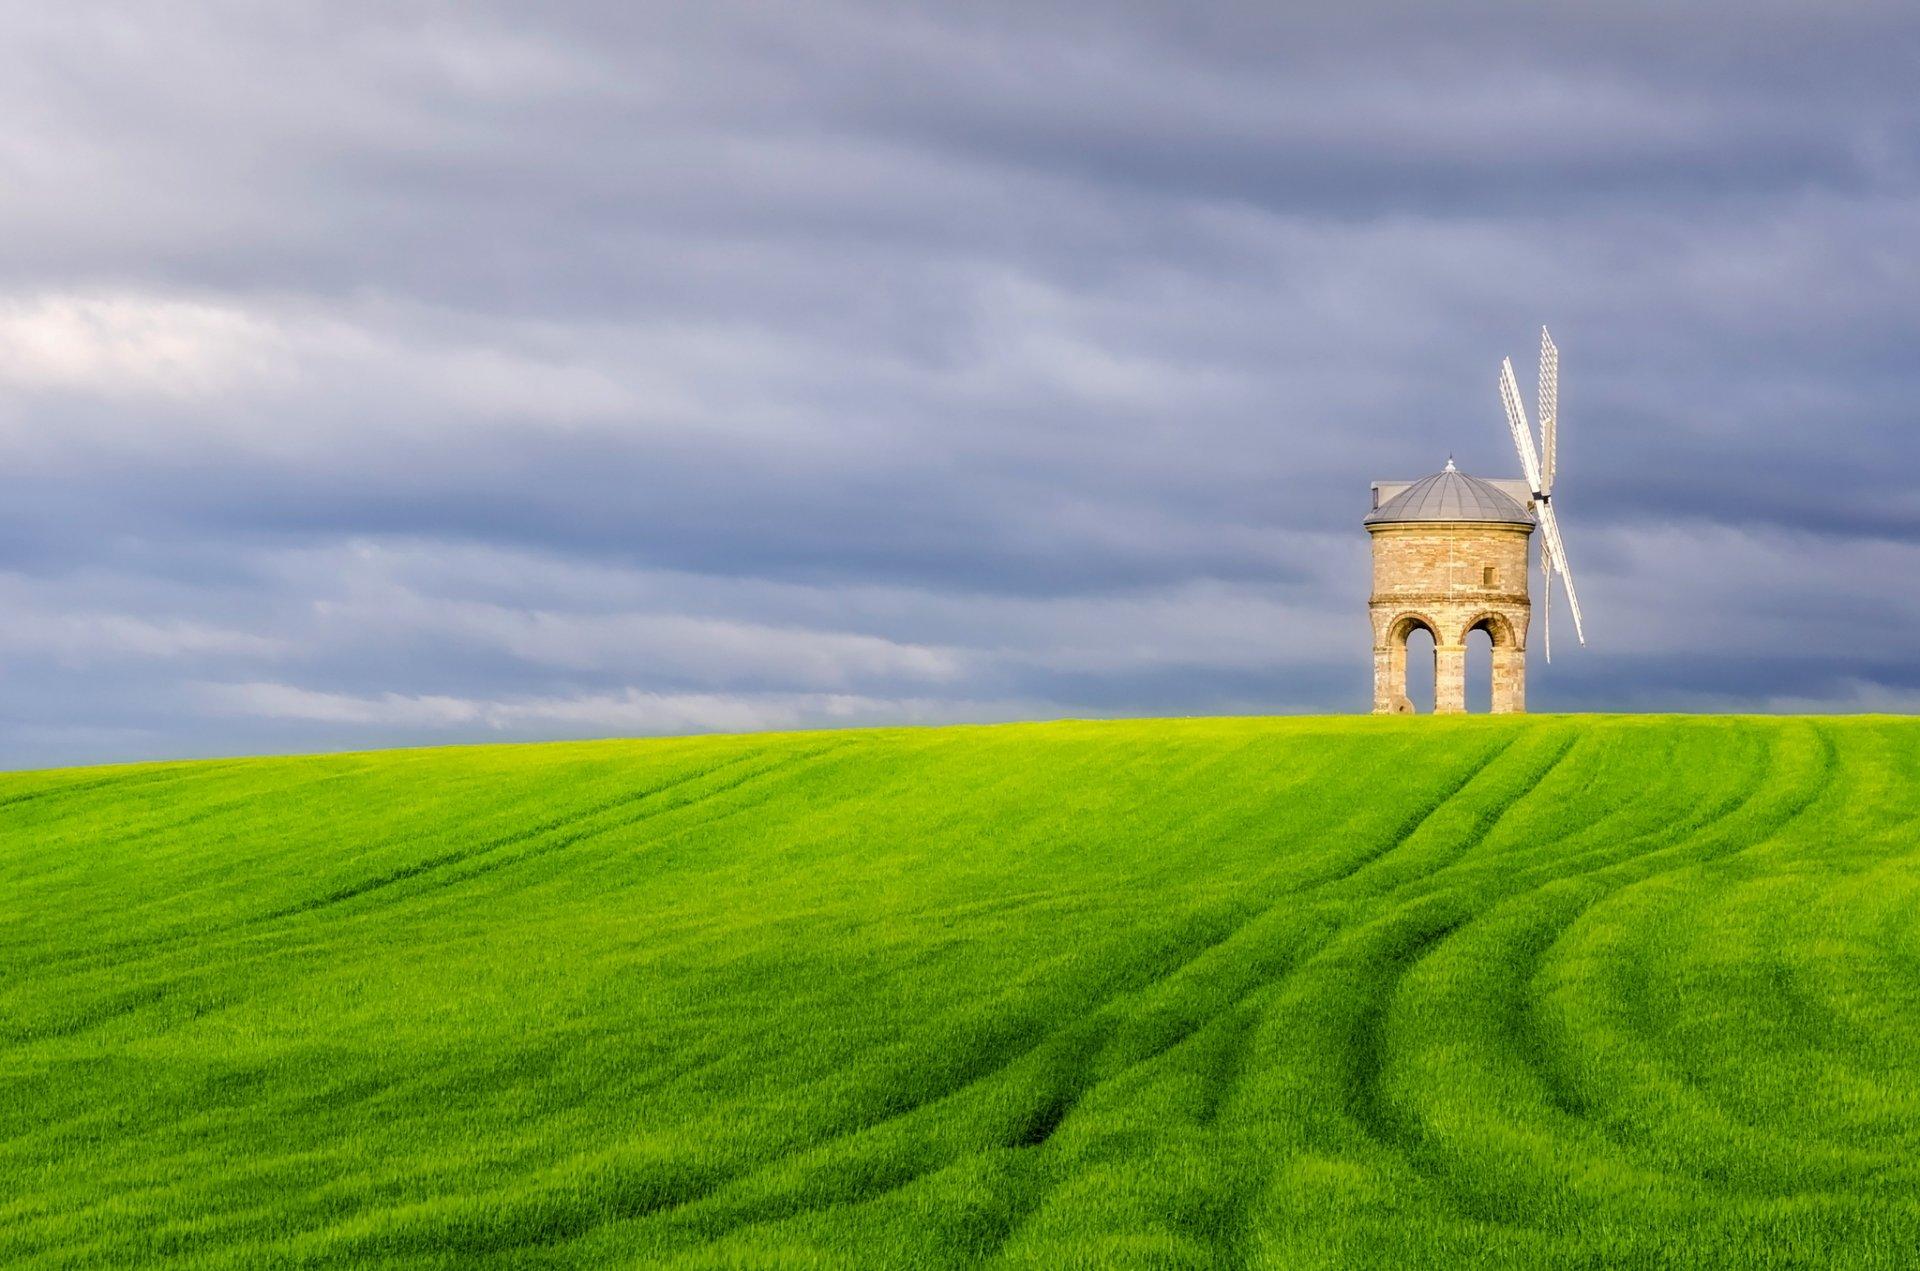 Pitstone Windmill, Bucks, England скачать